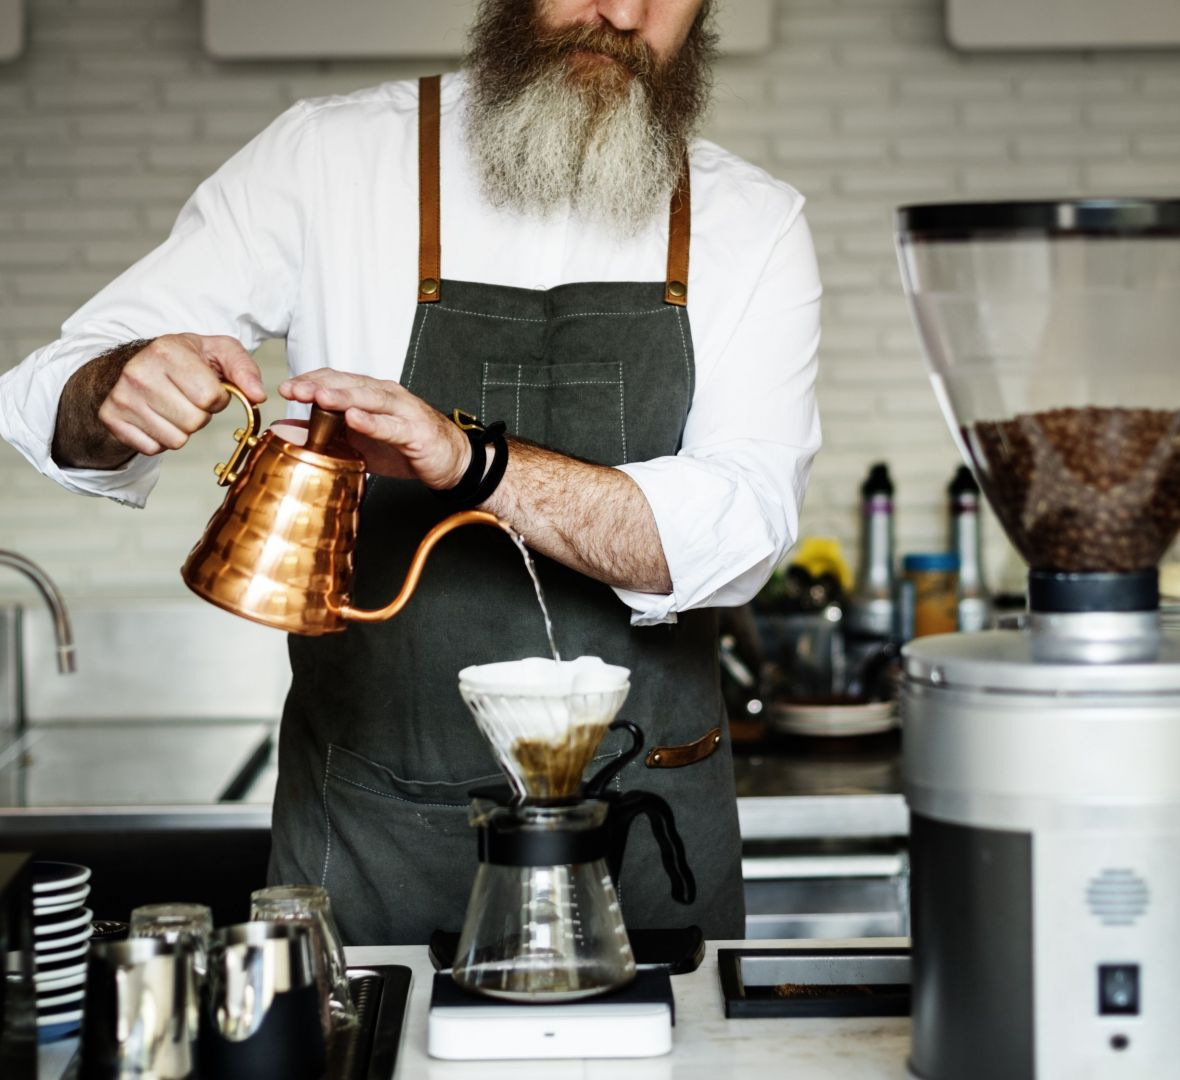 5 Tipps für den perfekten Kaffee